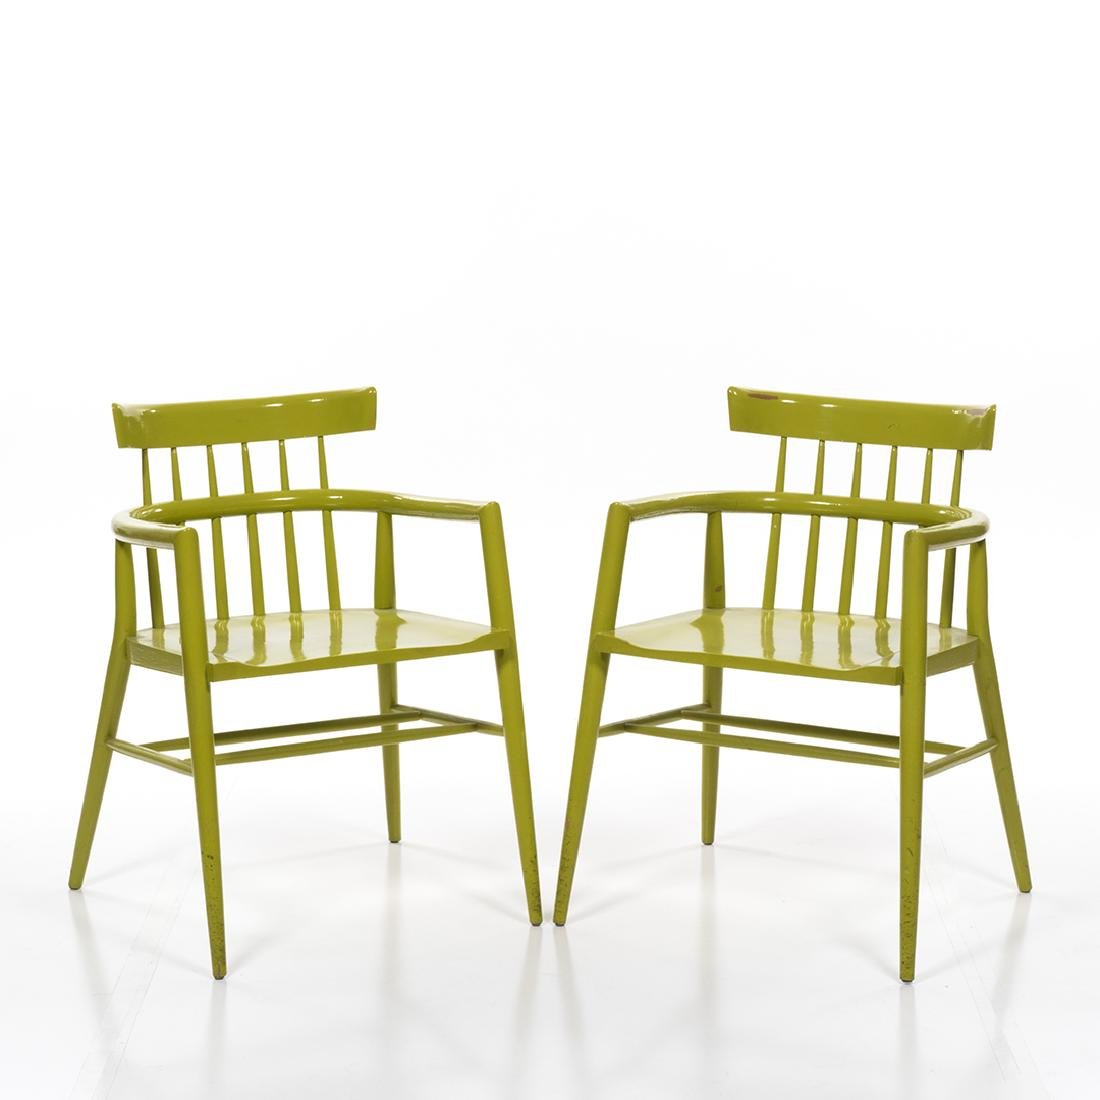 Paul McCobb Dining Chairs (6) - 3